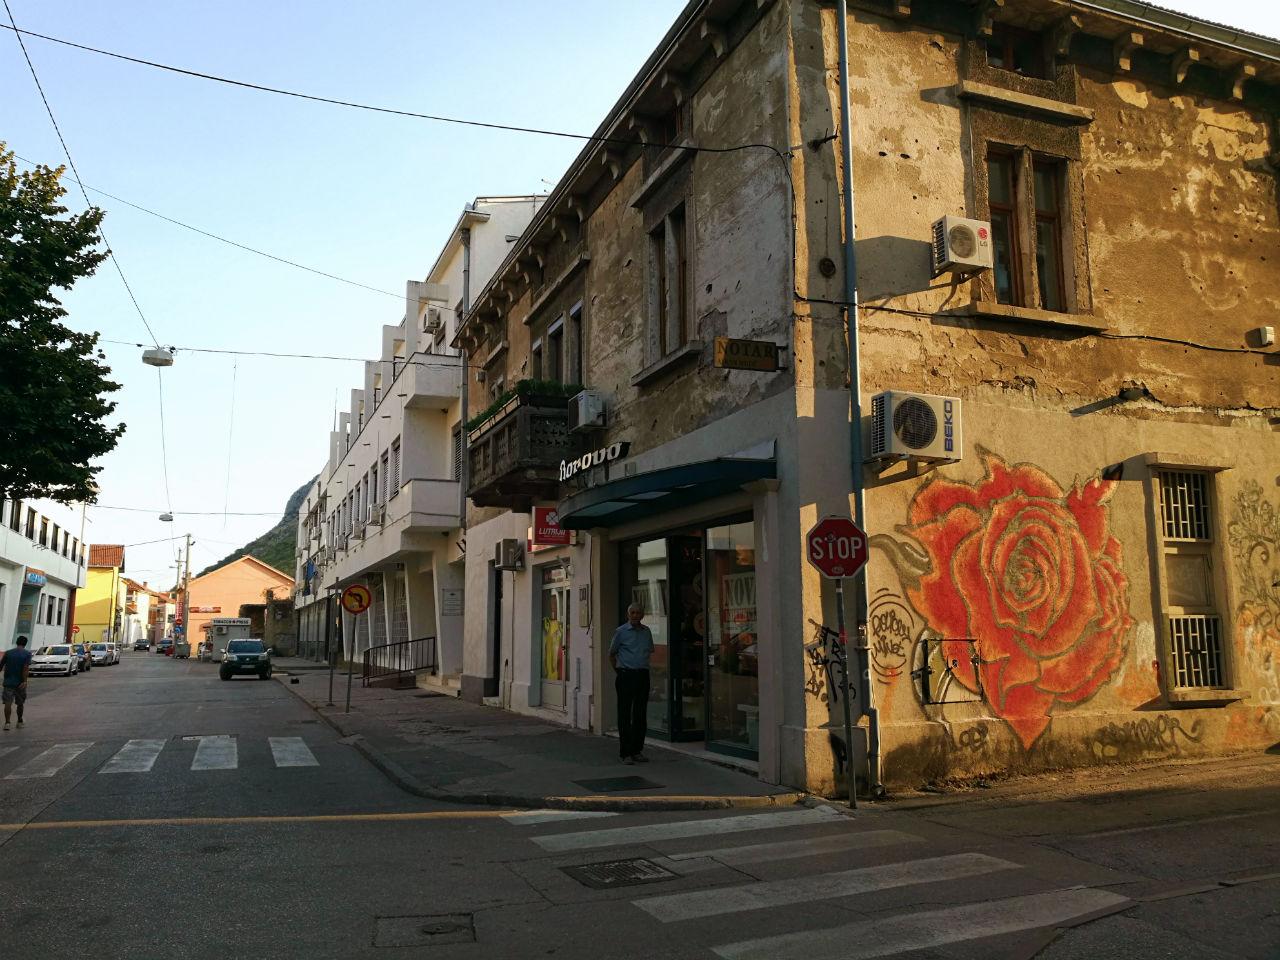 Mostar Little Mostar_Städtereise_Kurztrip_Geschichte